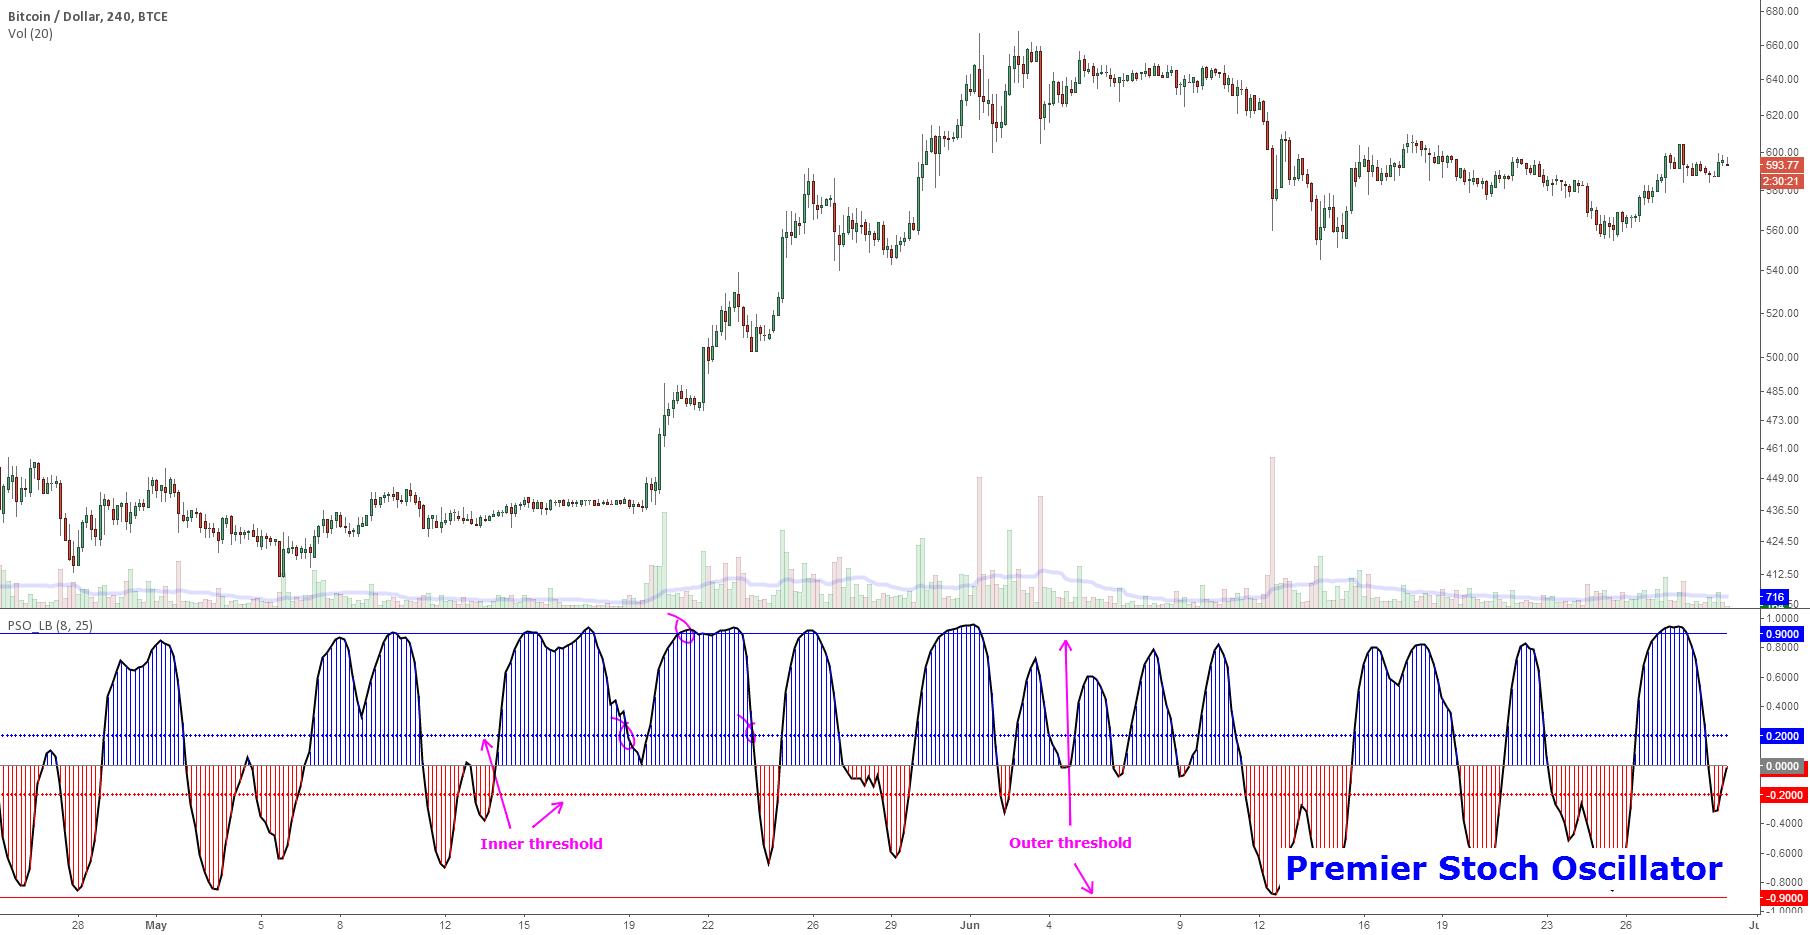 Indicator: Premier Stochastic Oscillator